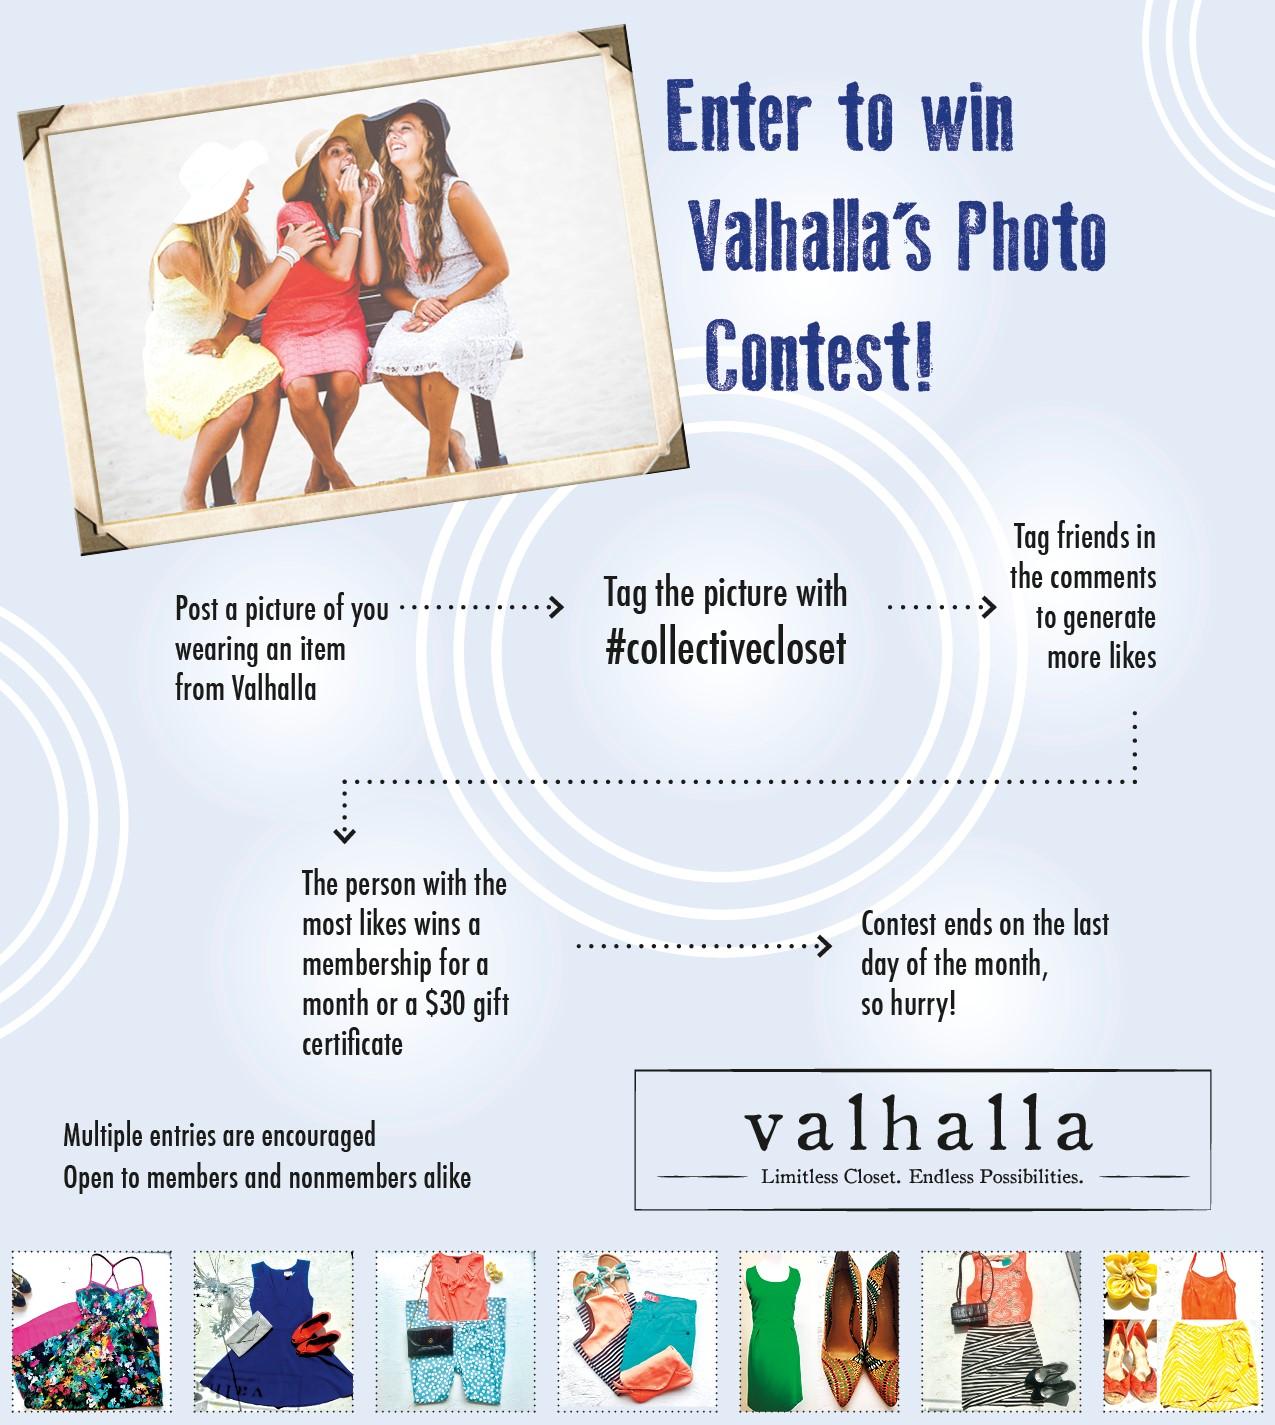 Valhalla Tampa Photo Contest - July